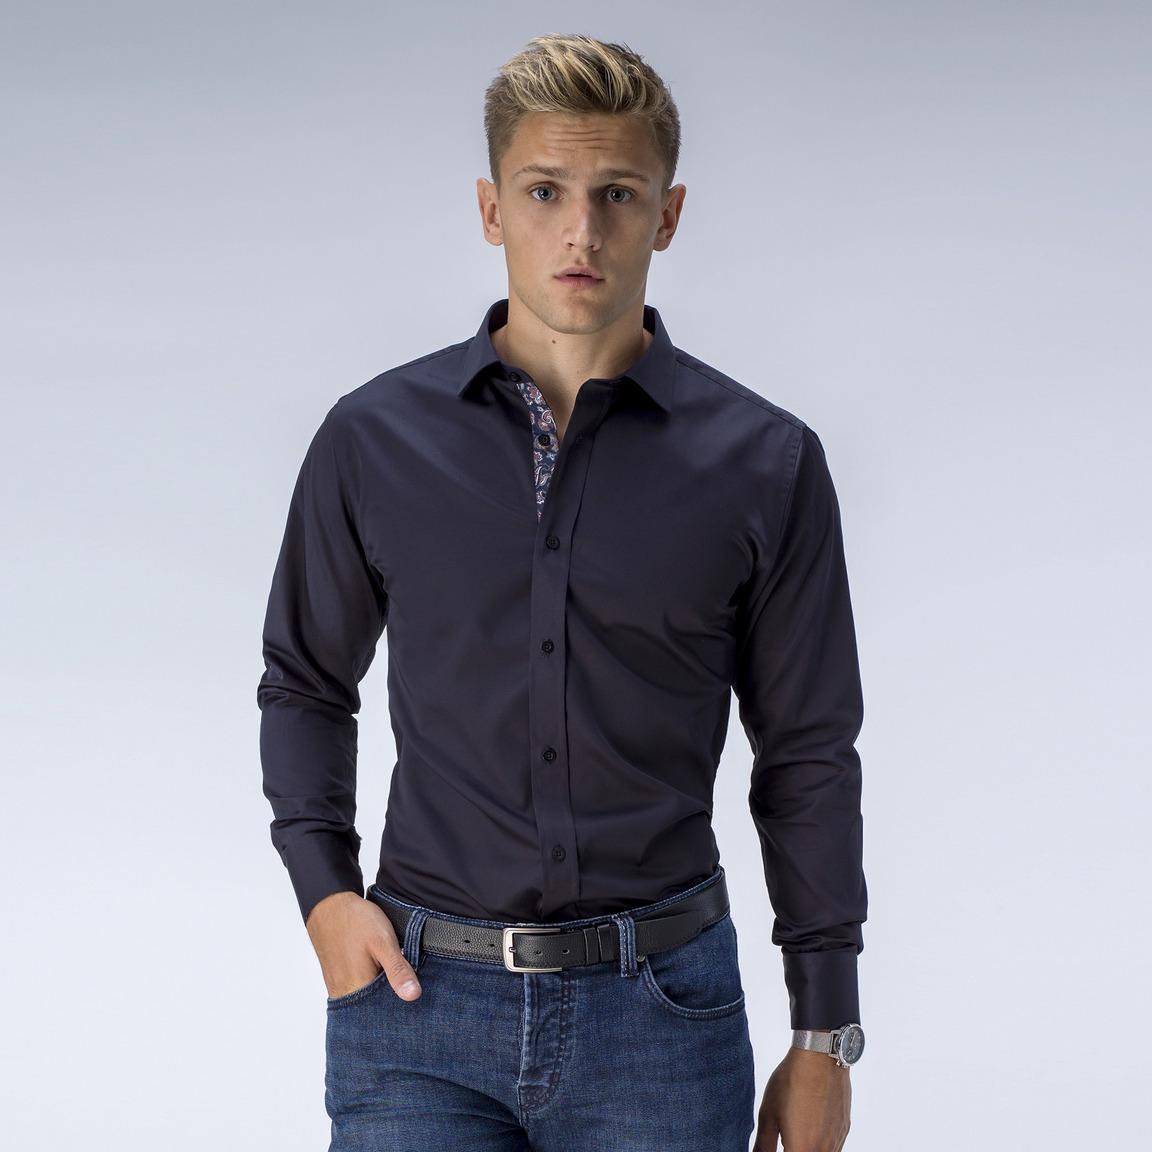 Svart skjorta med kontraster